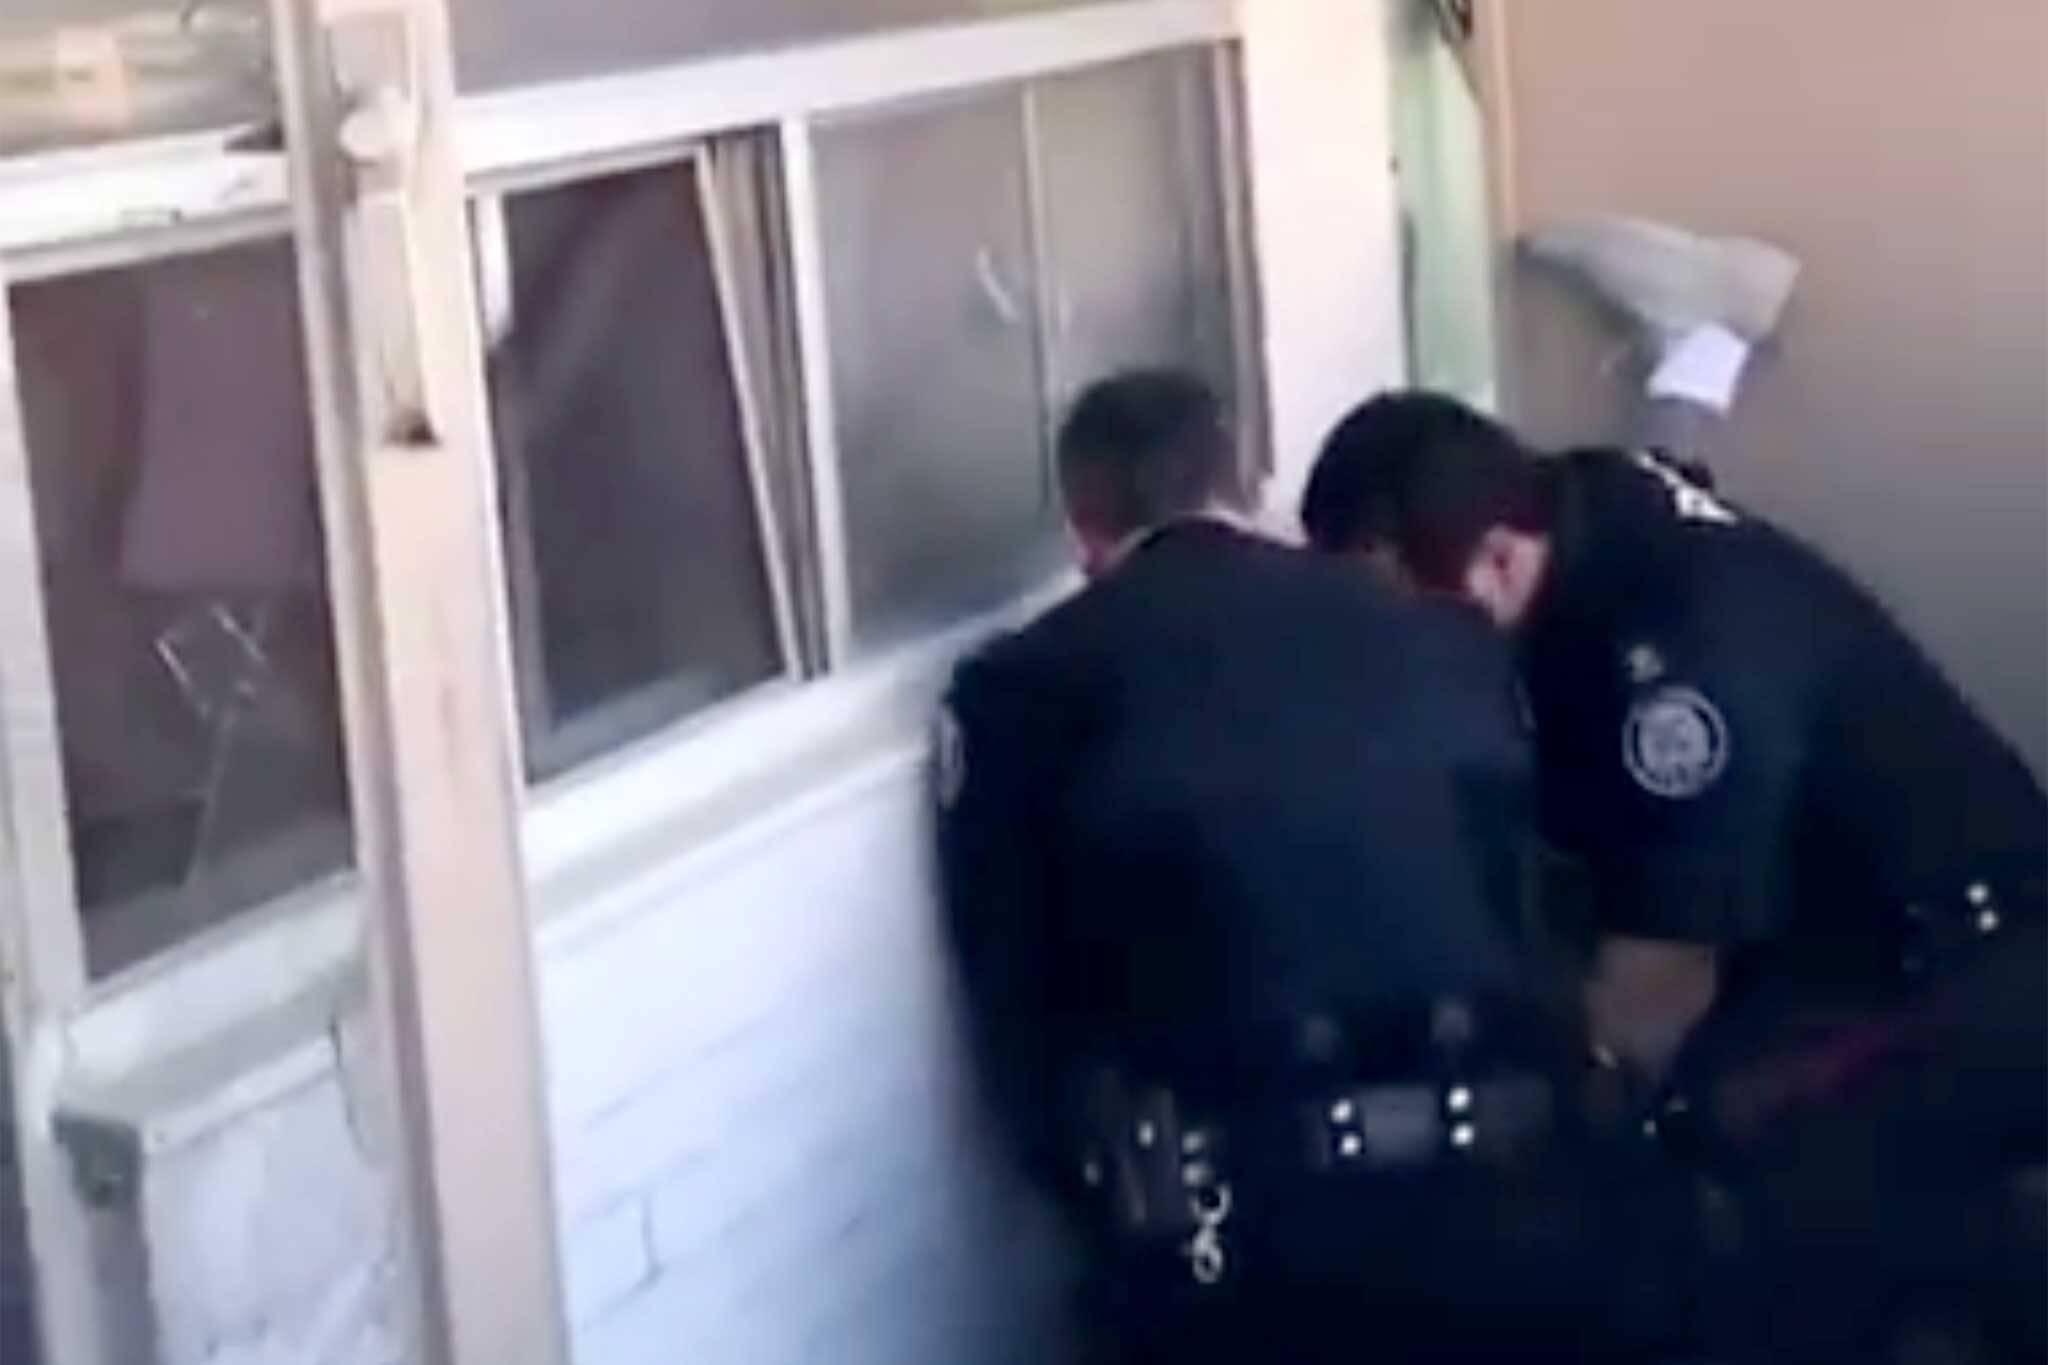 Toronto police video